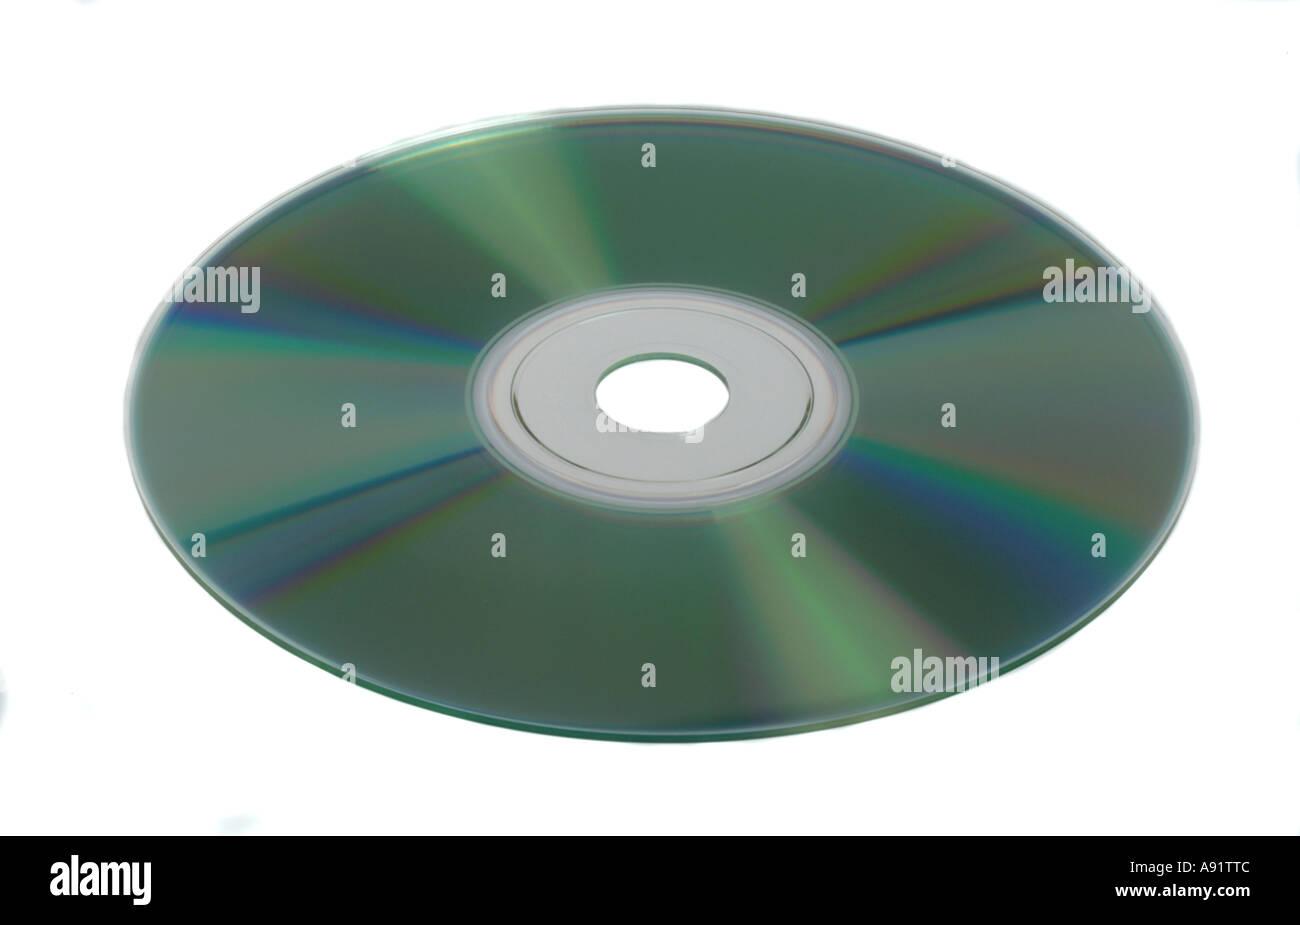 CD DVD Compact disc digital versatile disc - Stock Image